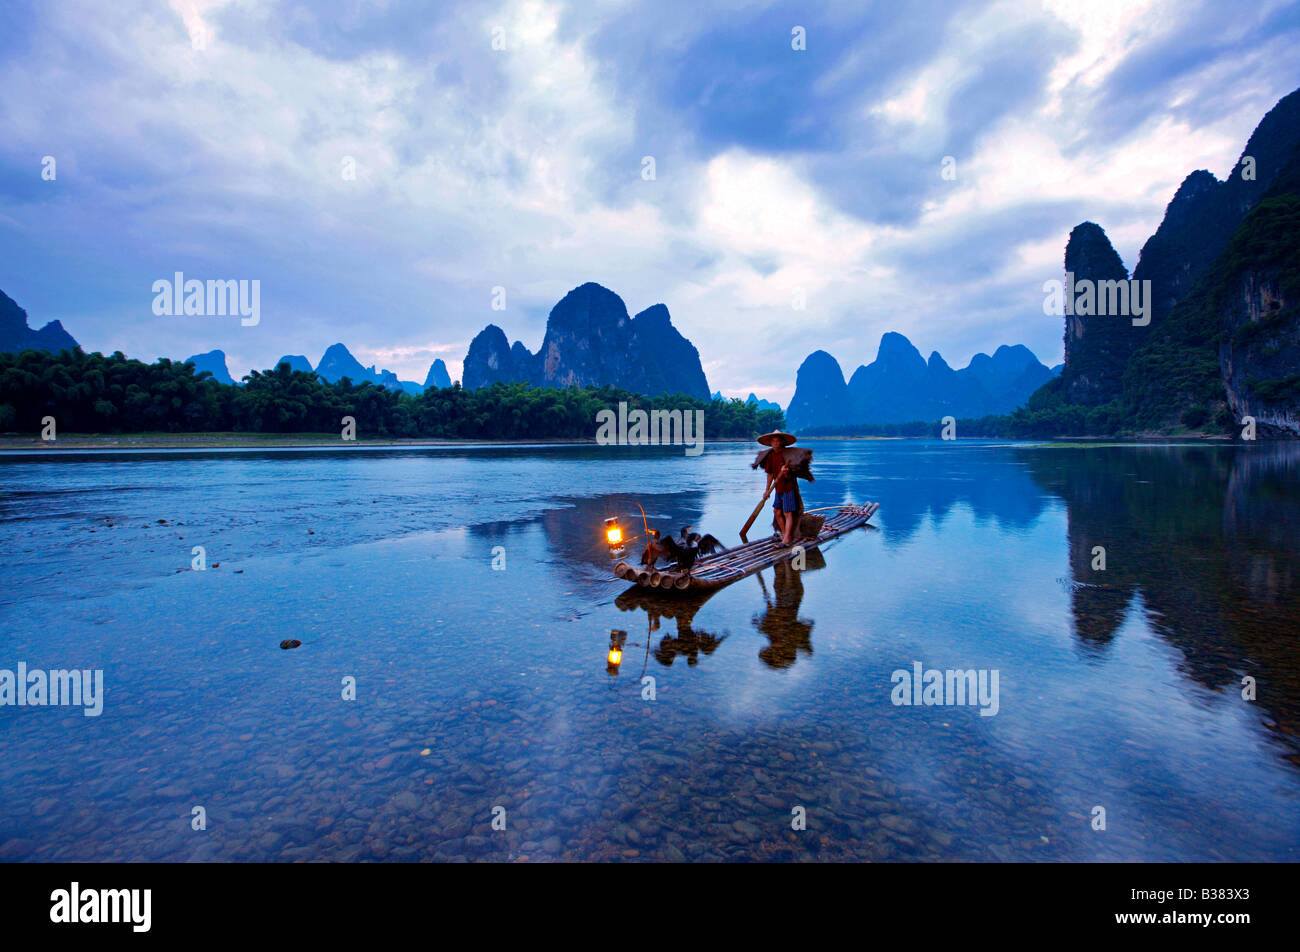 Cormorán pescador en el río Li Lijang Guilin Xingping provincia China de despacho modelo 701 Foto de stock